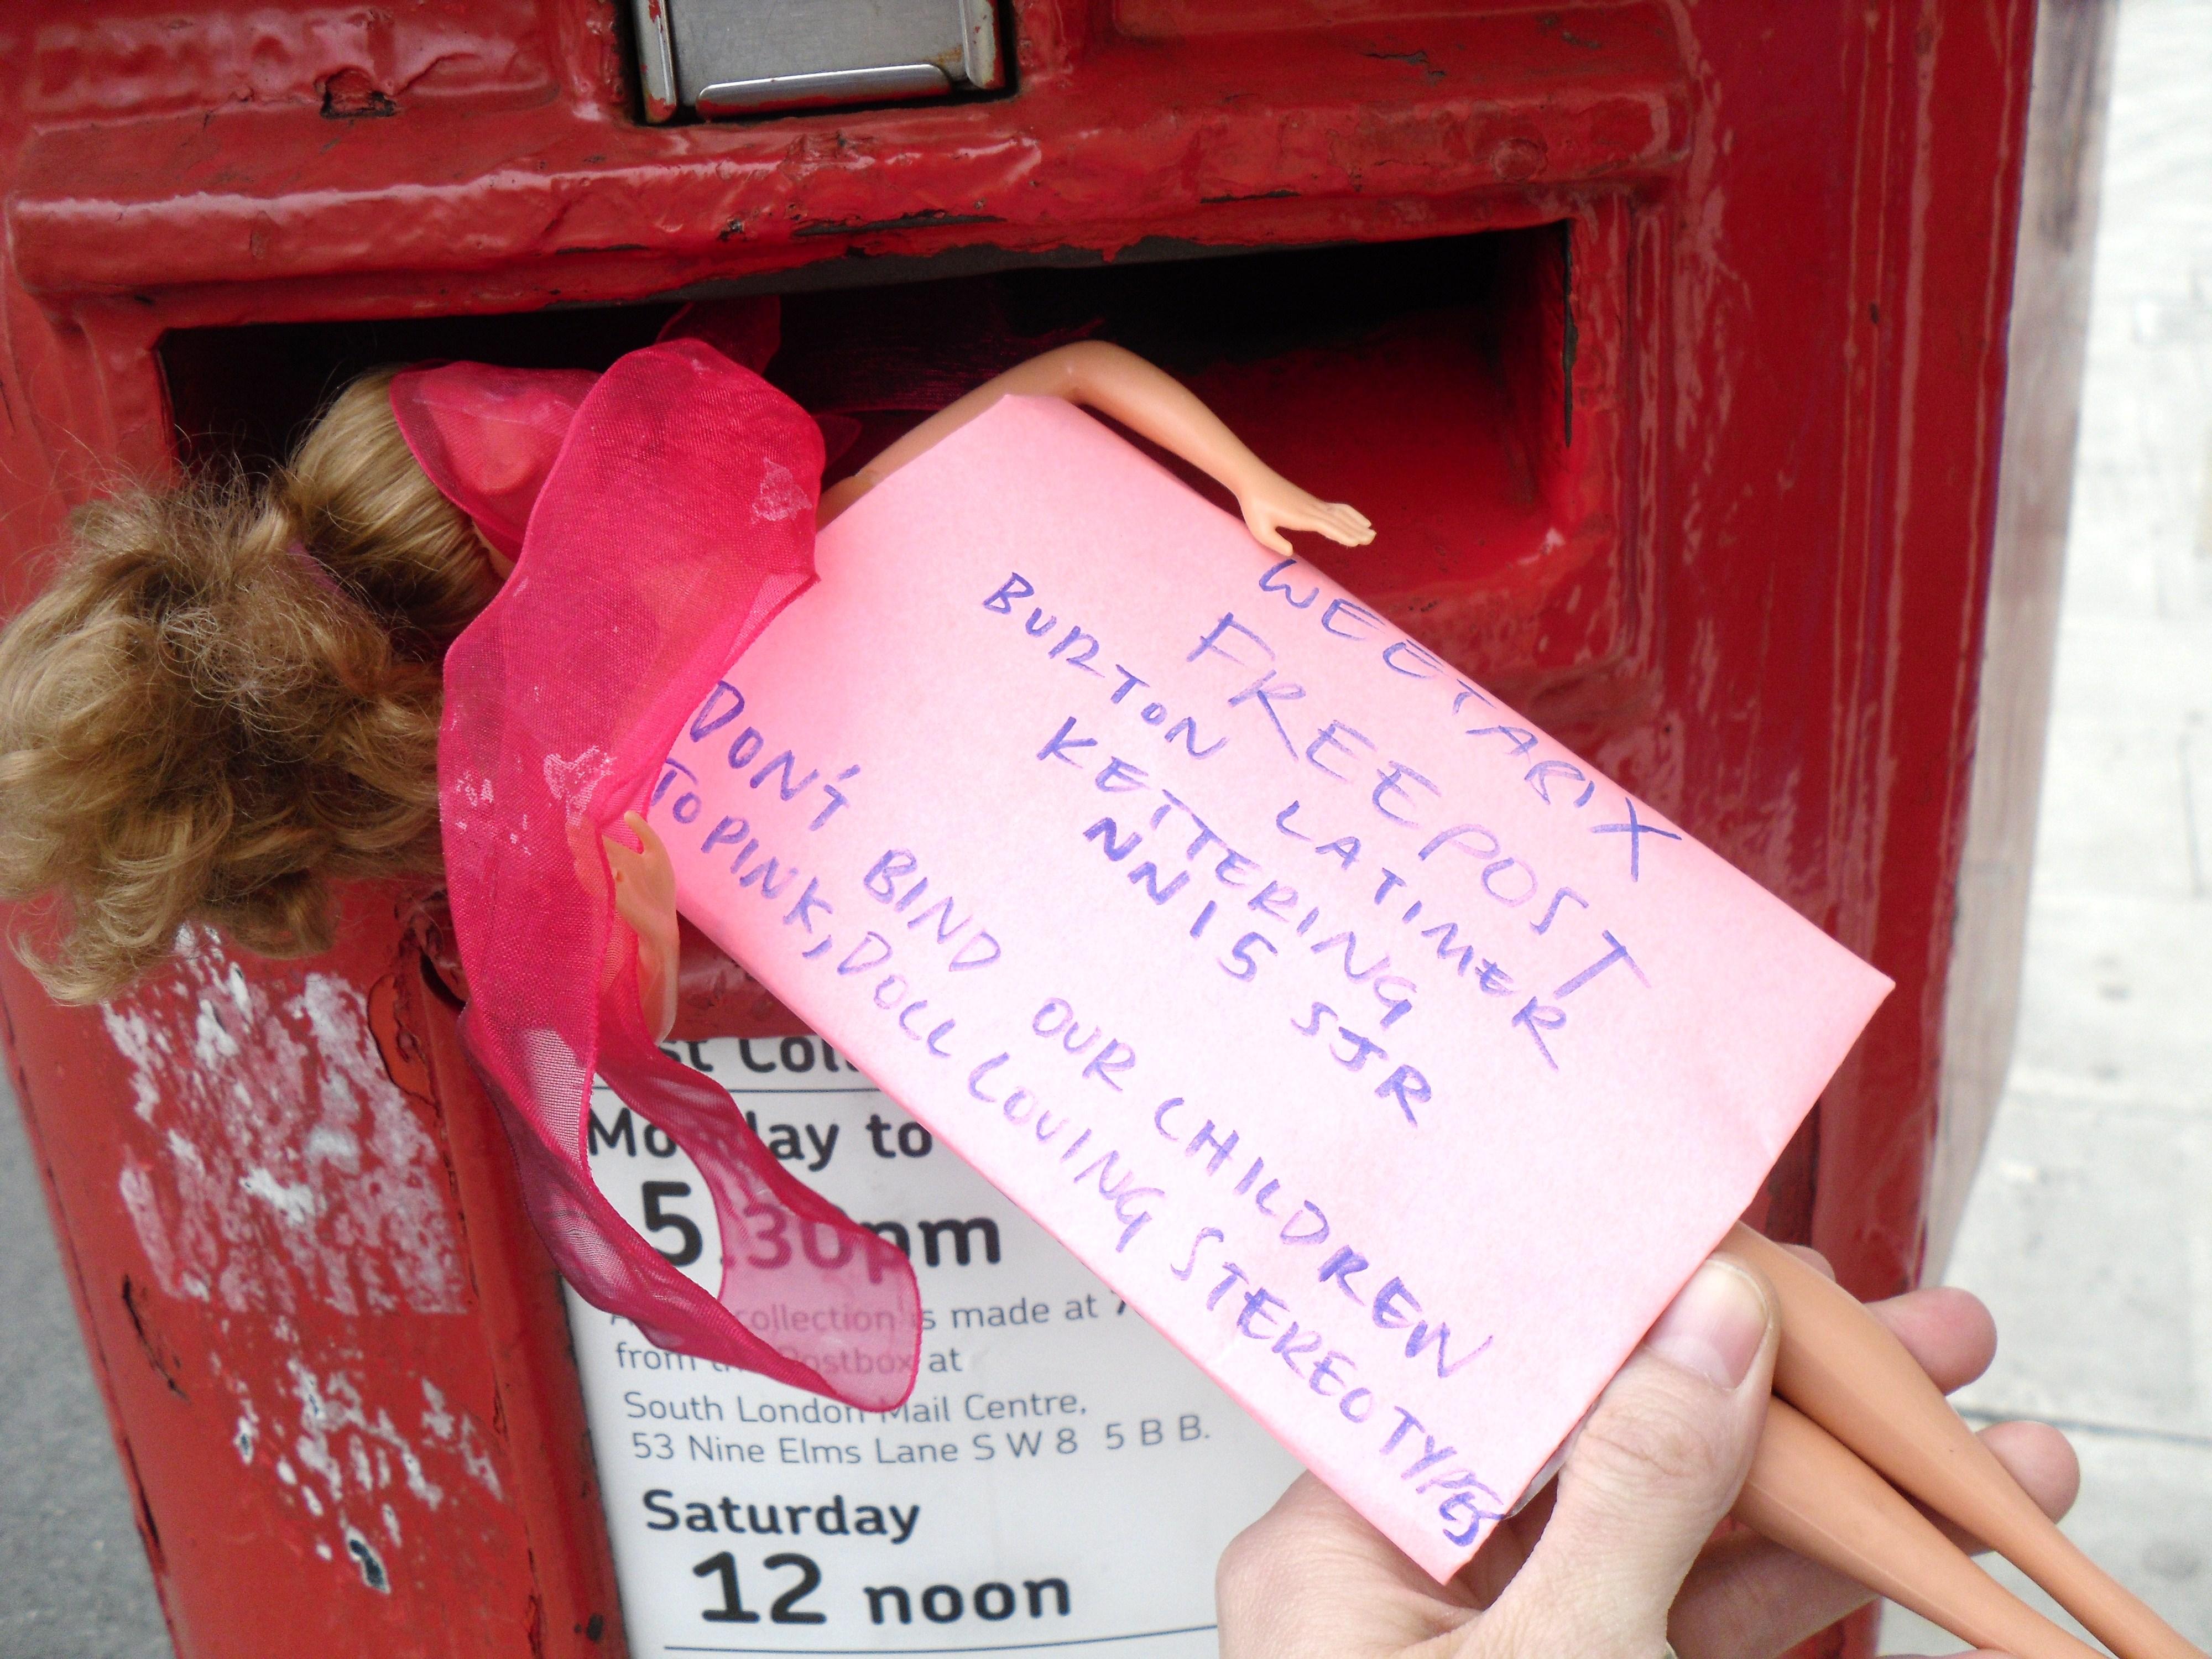 Barbie Mail Weetabix Gender Protest